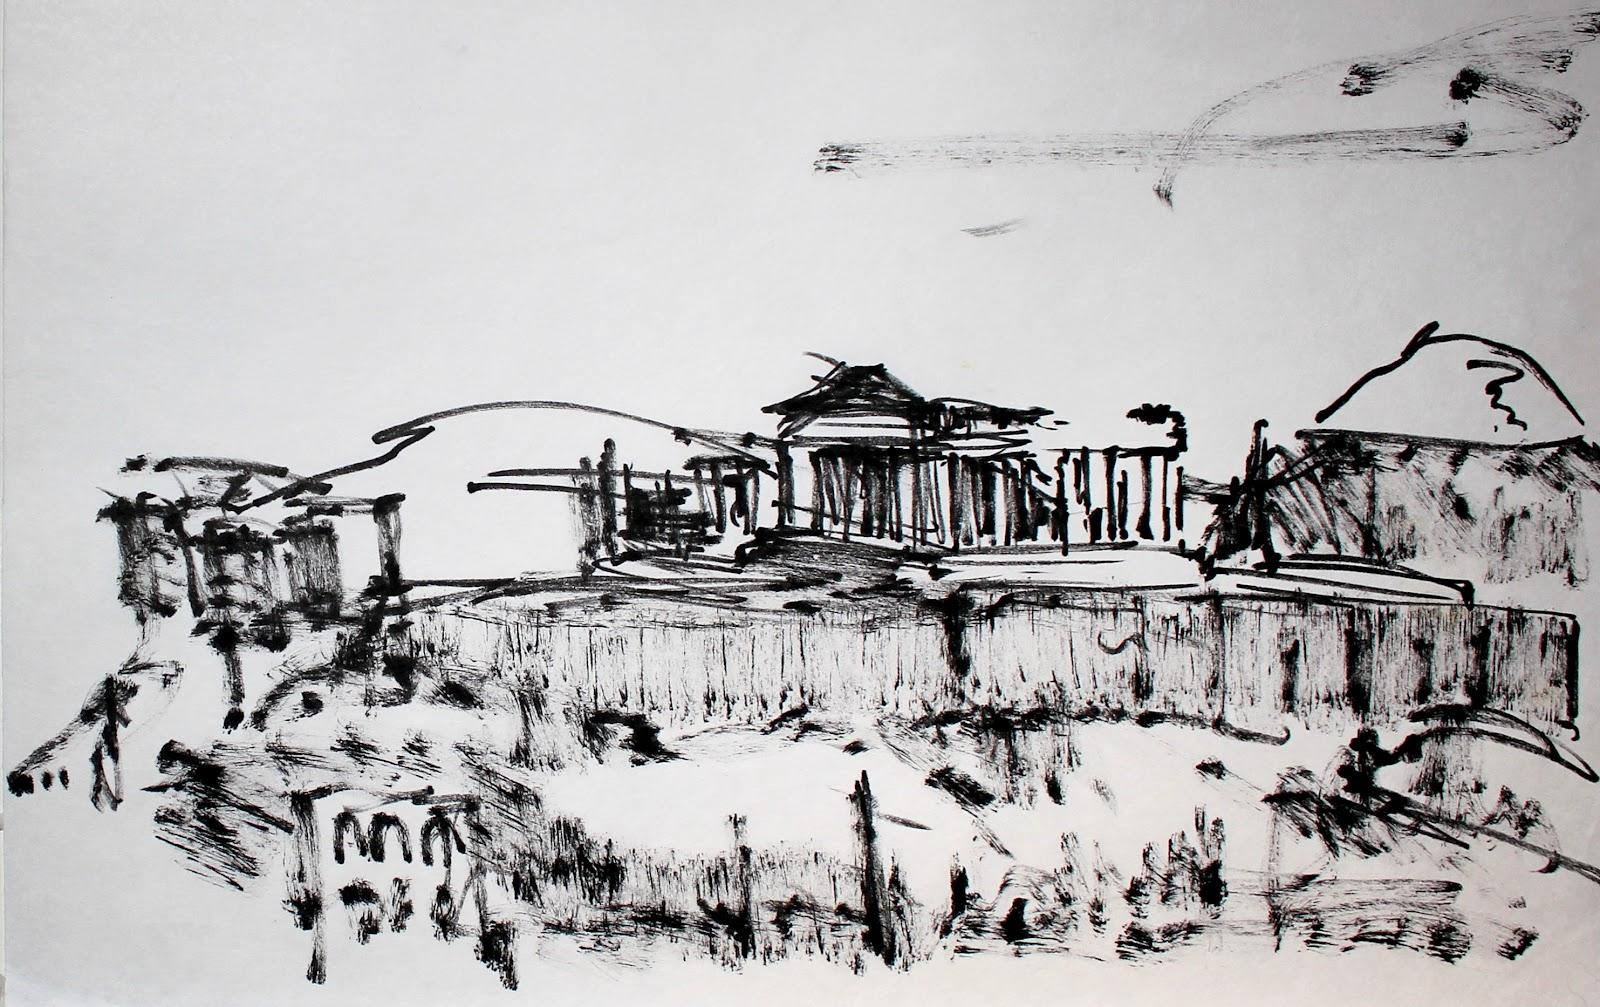 Acropolis Drawing Acropolis drawing